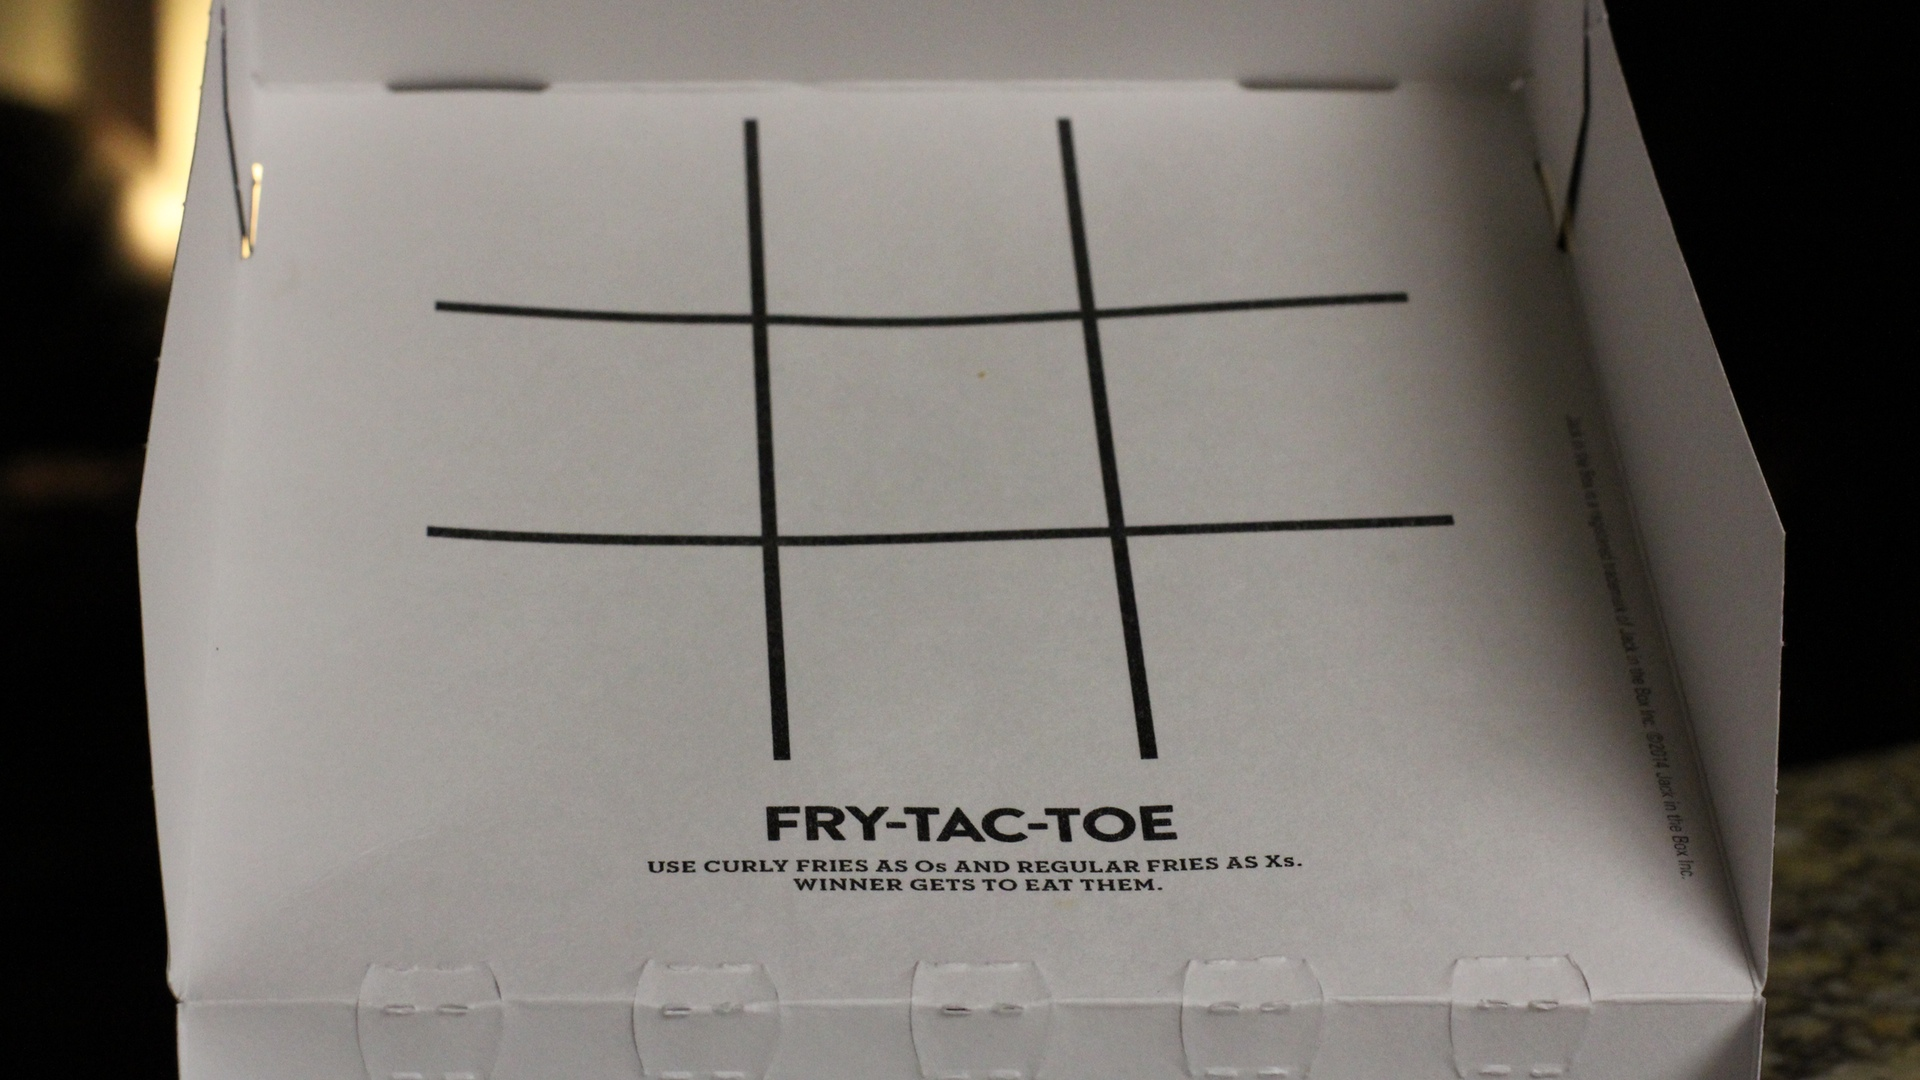 Fry-Tac-Toe